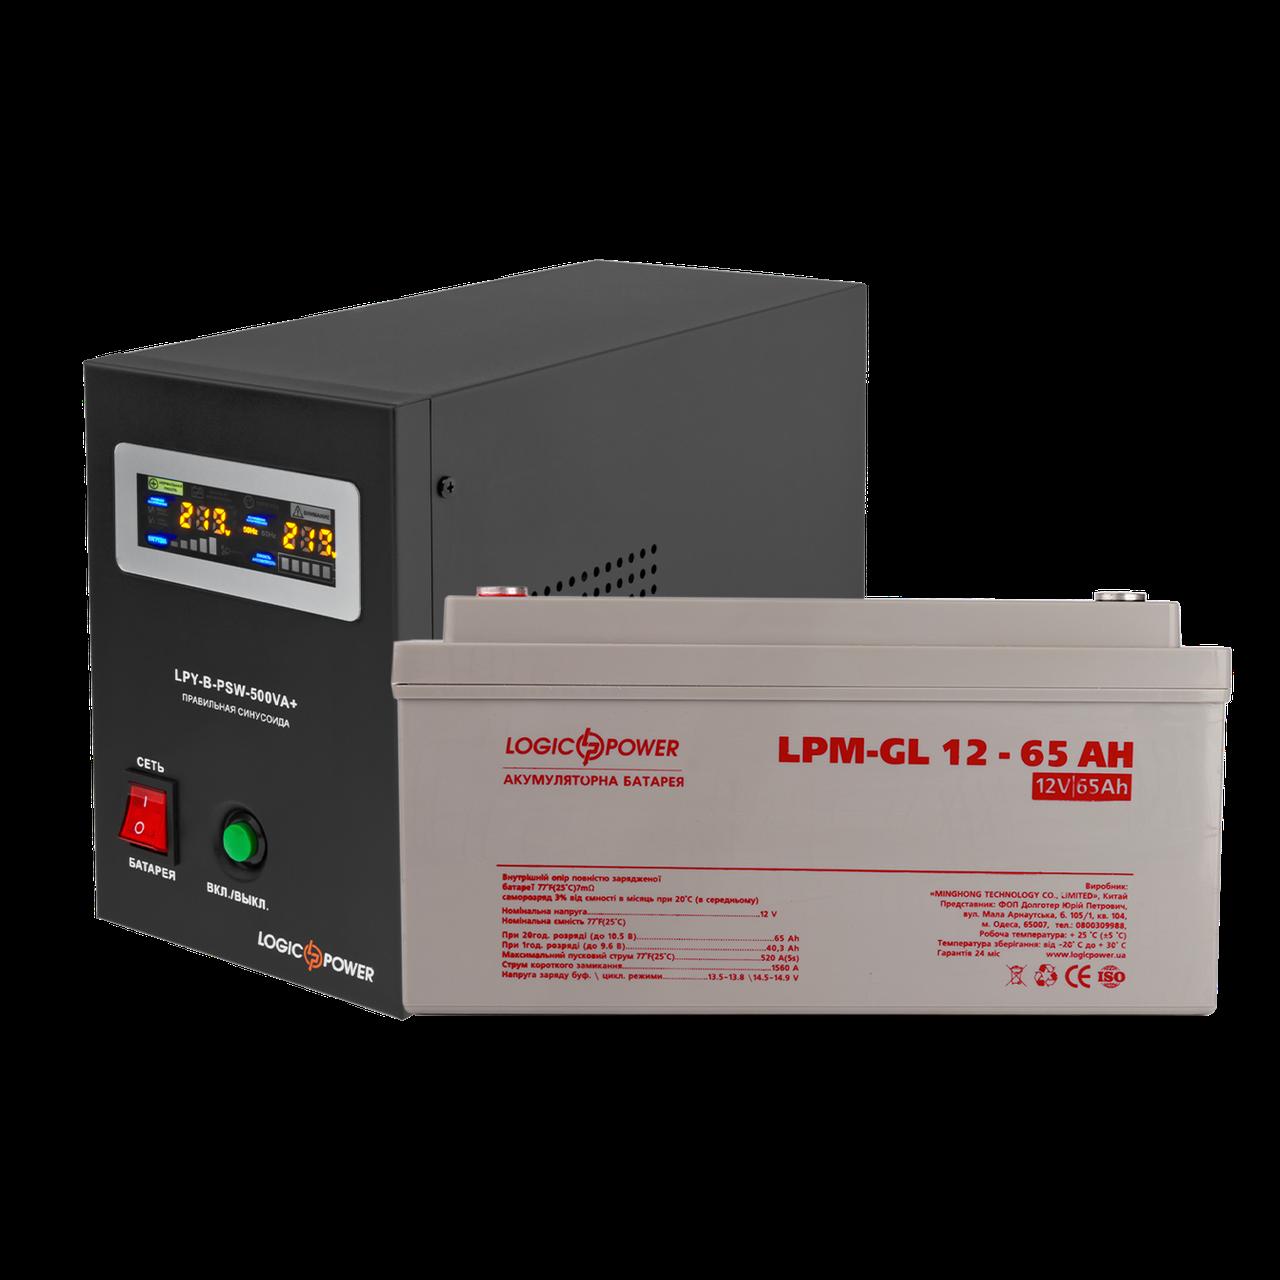 Комплект резервного питания для котла Logicpower B500 + гелевая батарея 900ватт